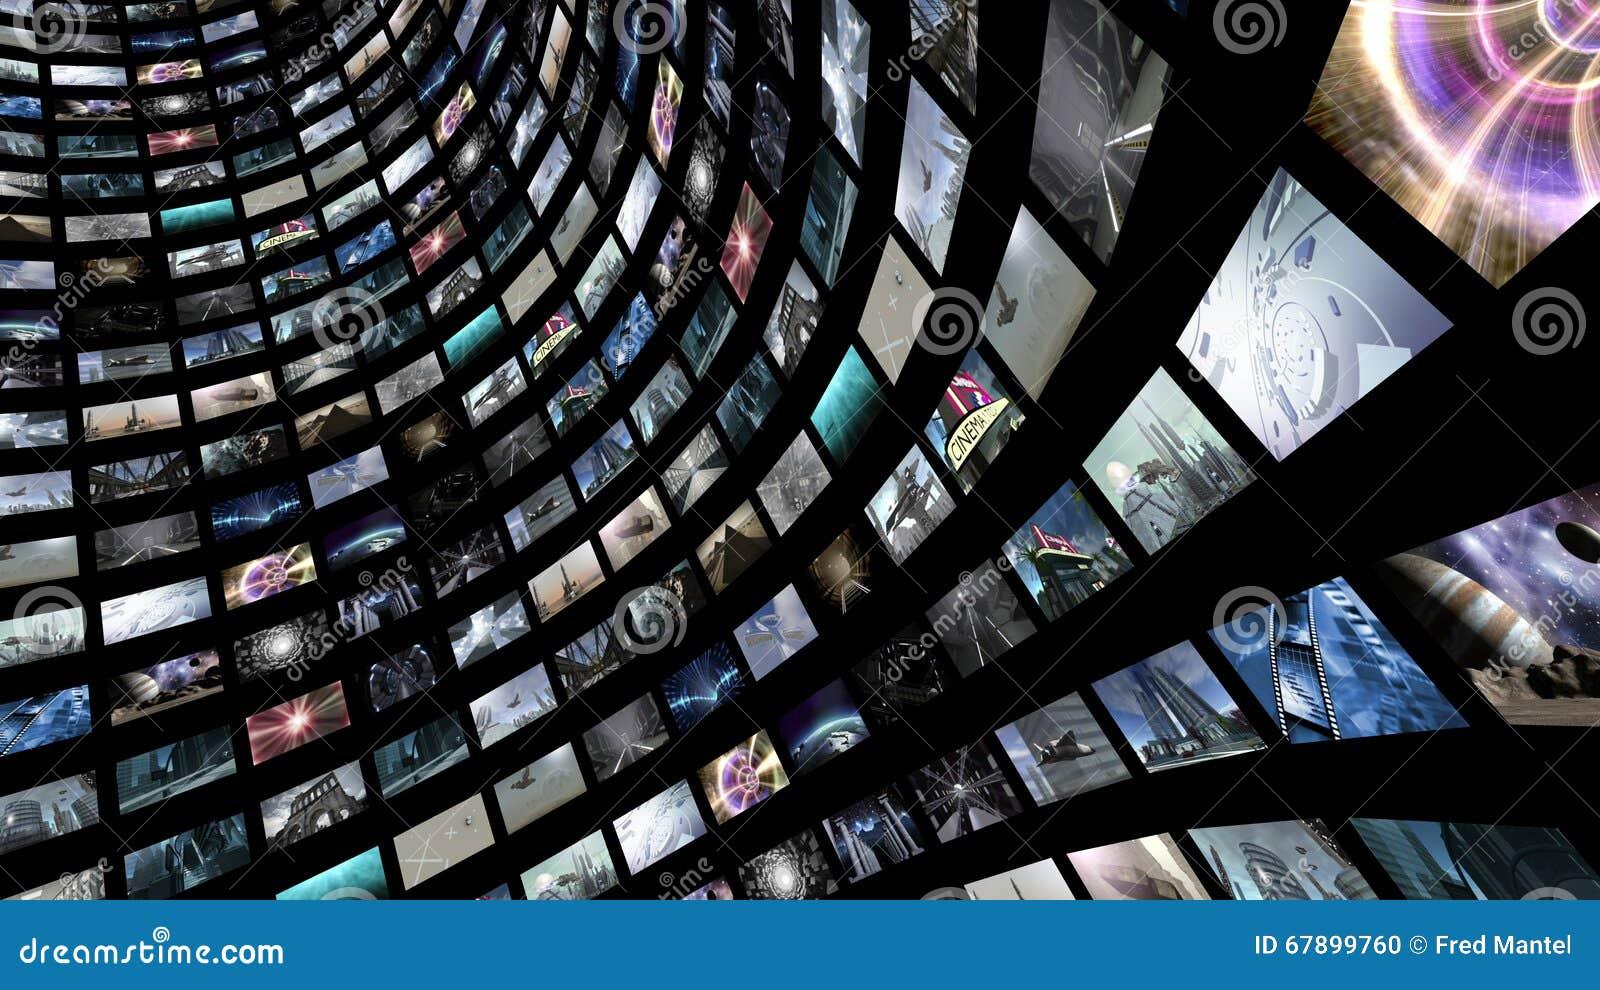 Videomuur met vele kleine monitors